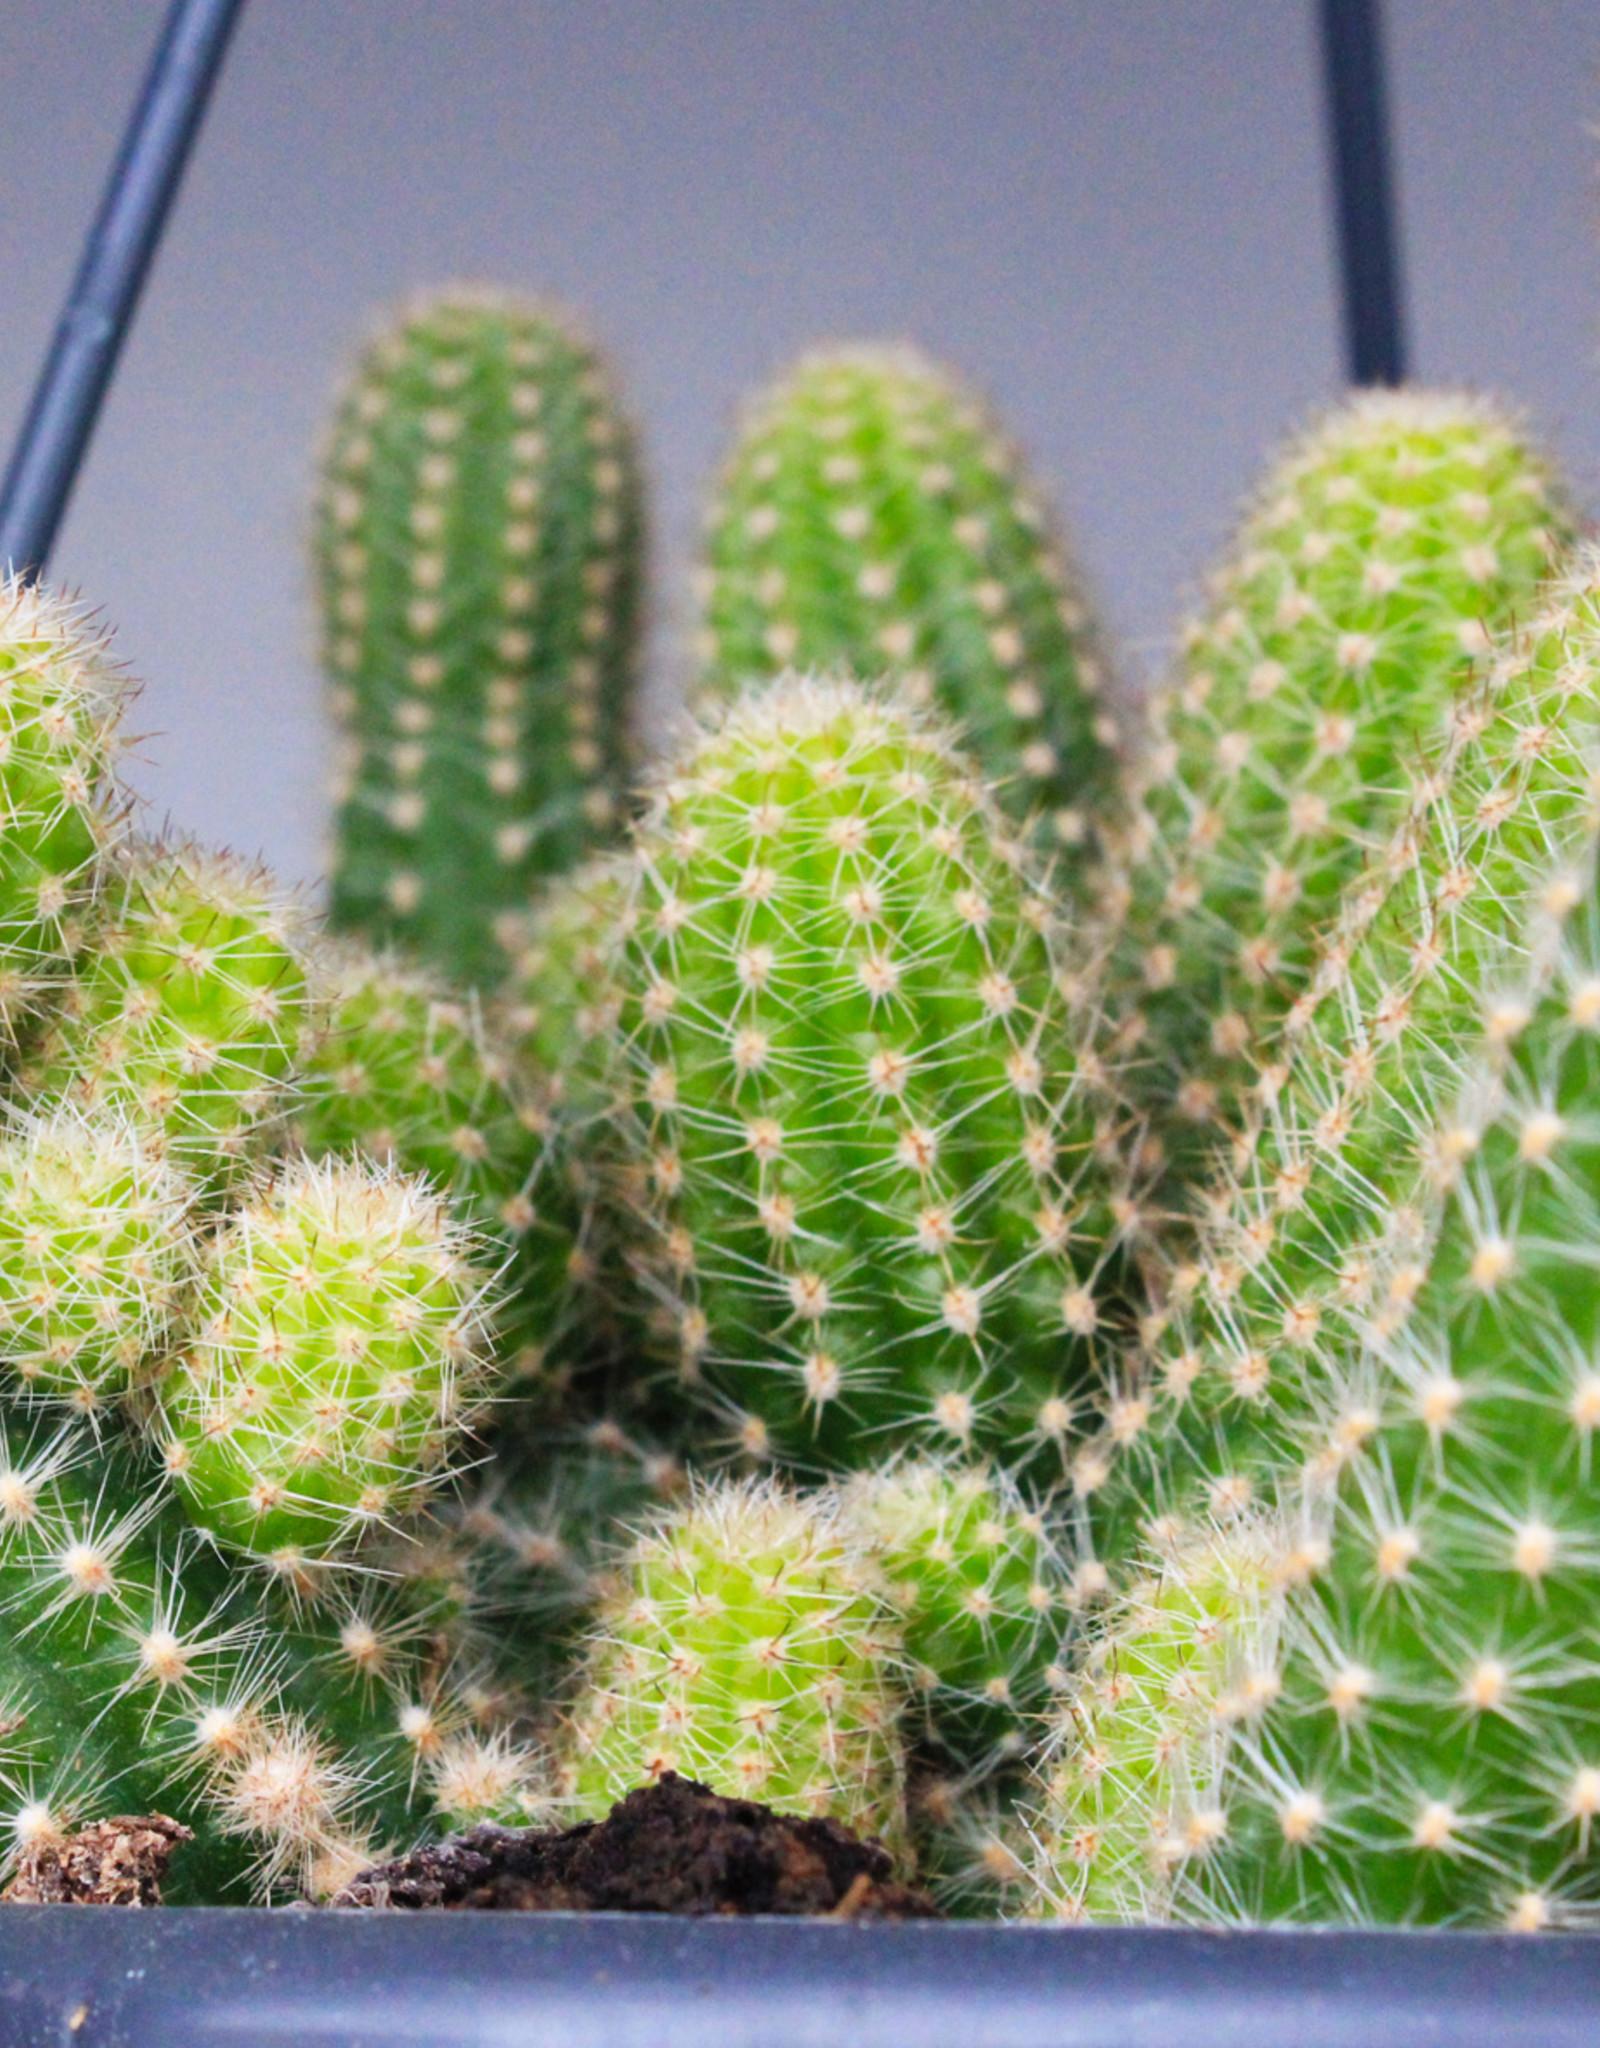 Chamaelobivia hybrid - Peanut Cactus